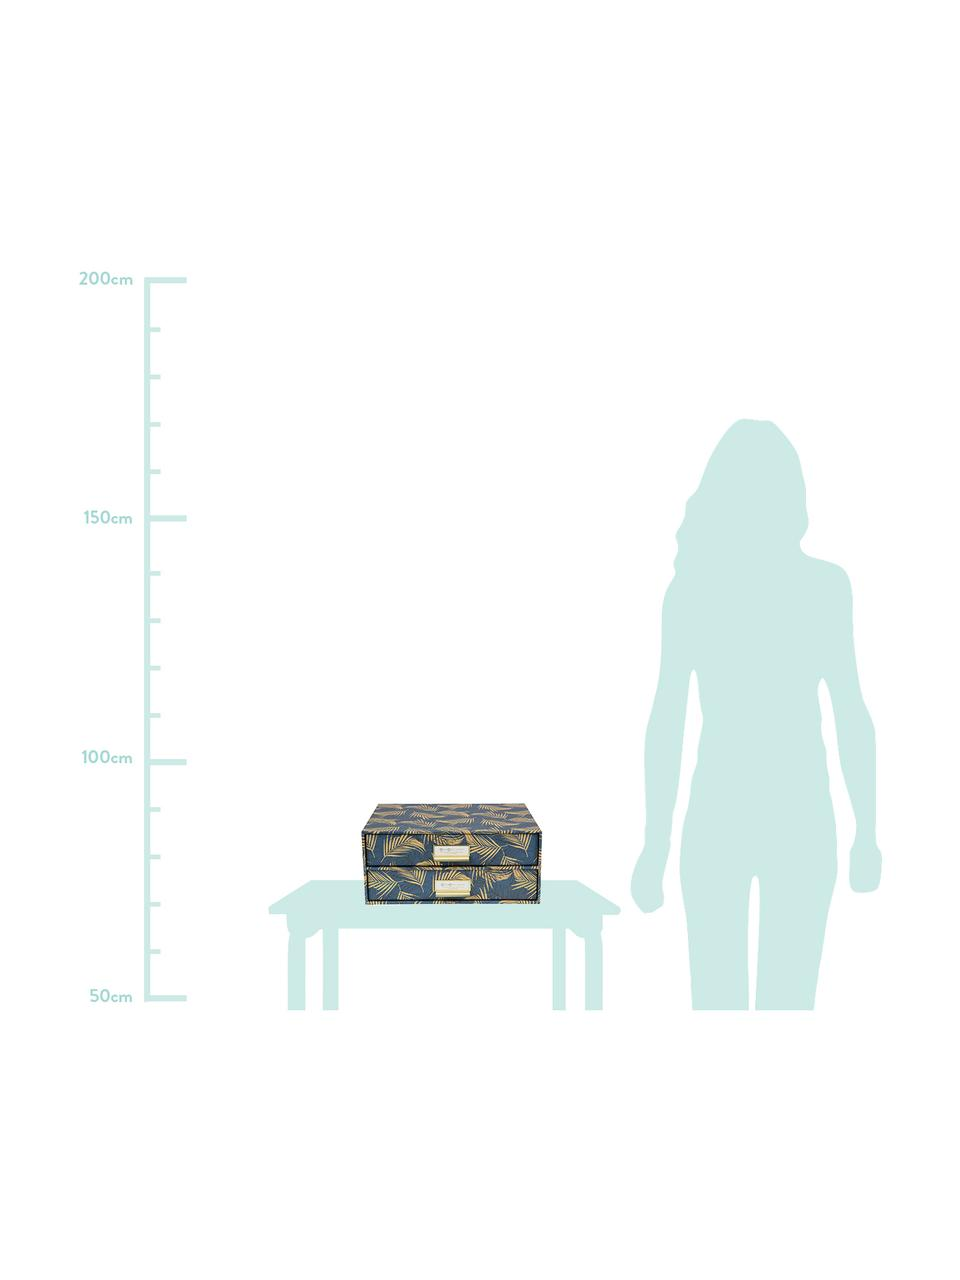 Büro-Organizer Birger, Organizer: Fester, laminierter Karto, Goldfarben, Graublau, 33 x 15 cm